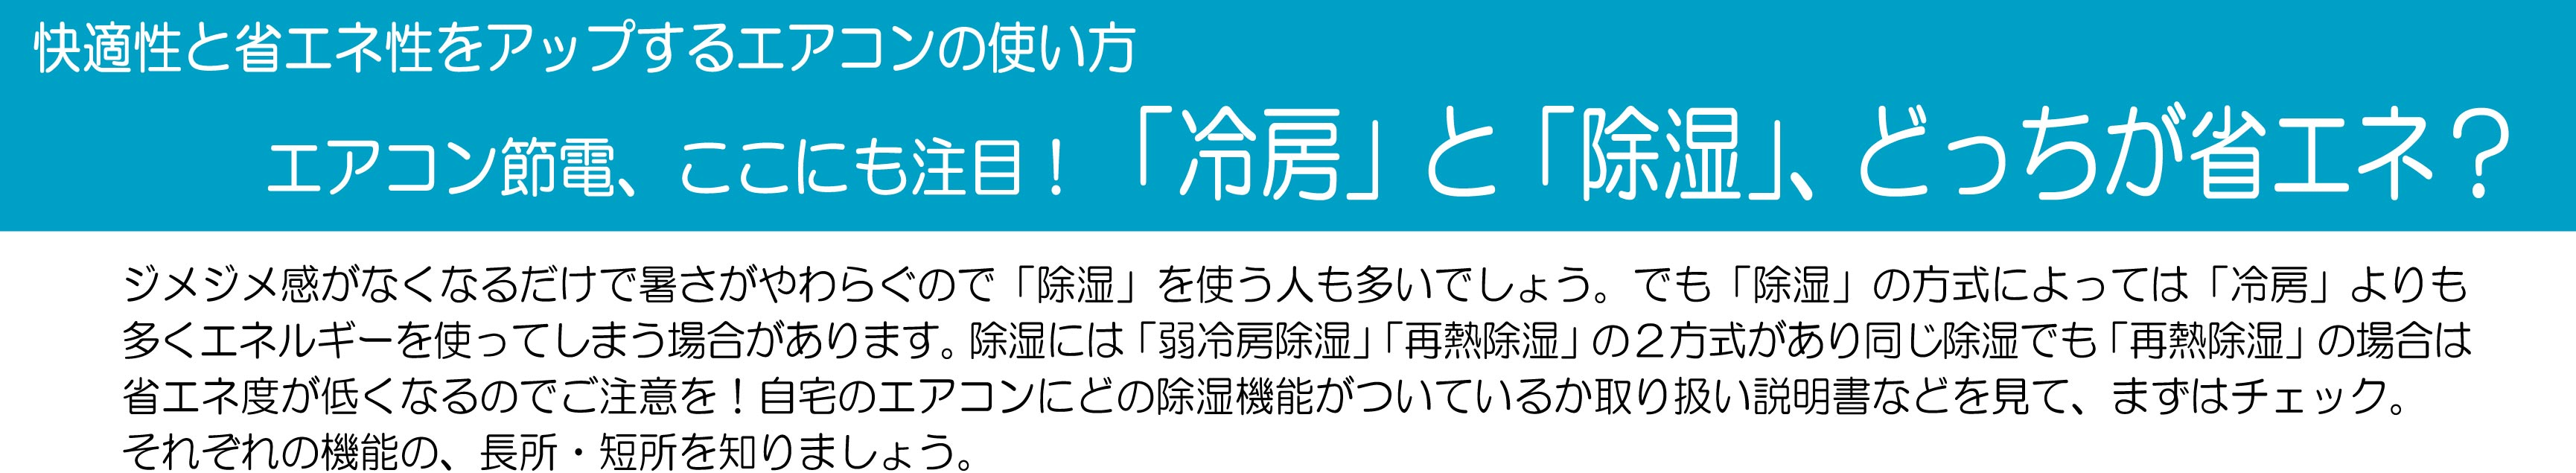 KuraSi-natu-sin74-08.jpg